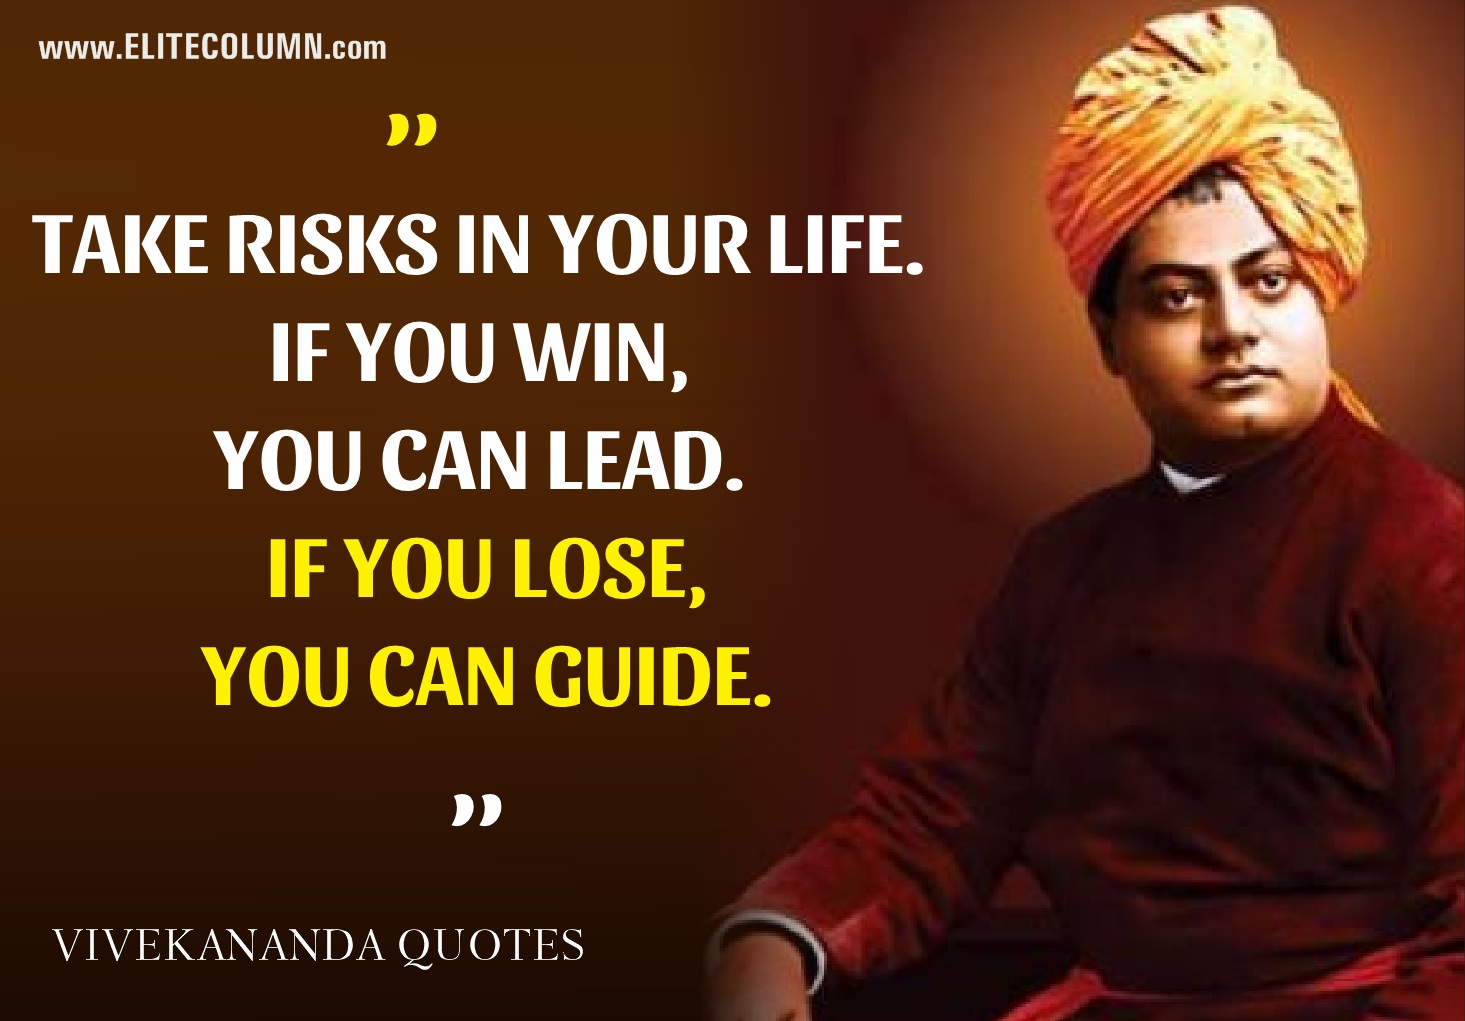 Vivekananda Quotes (5)